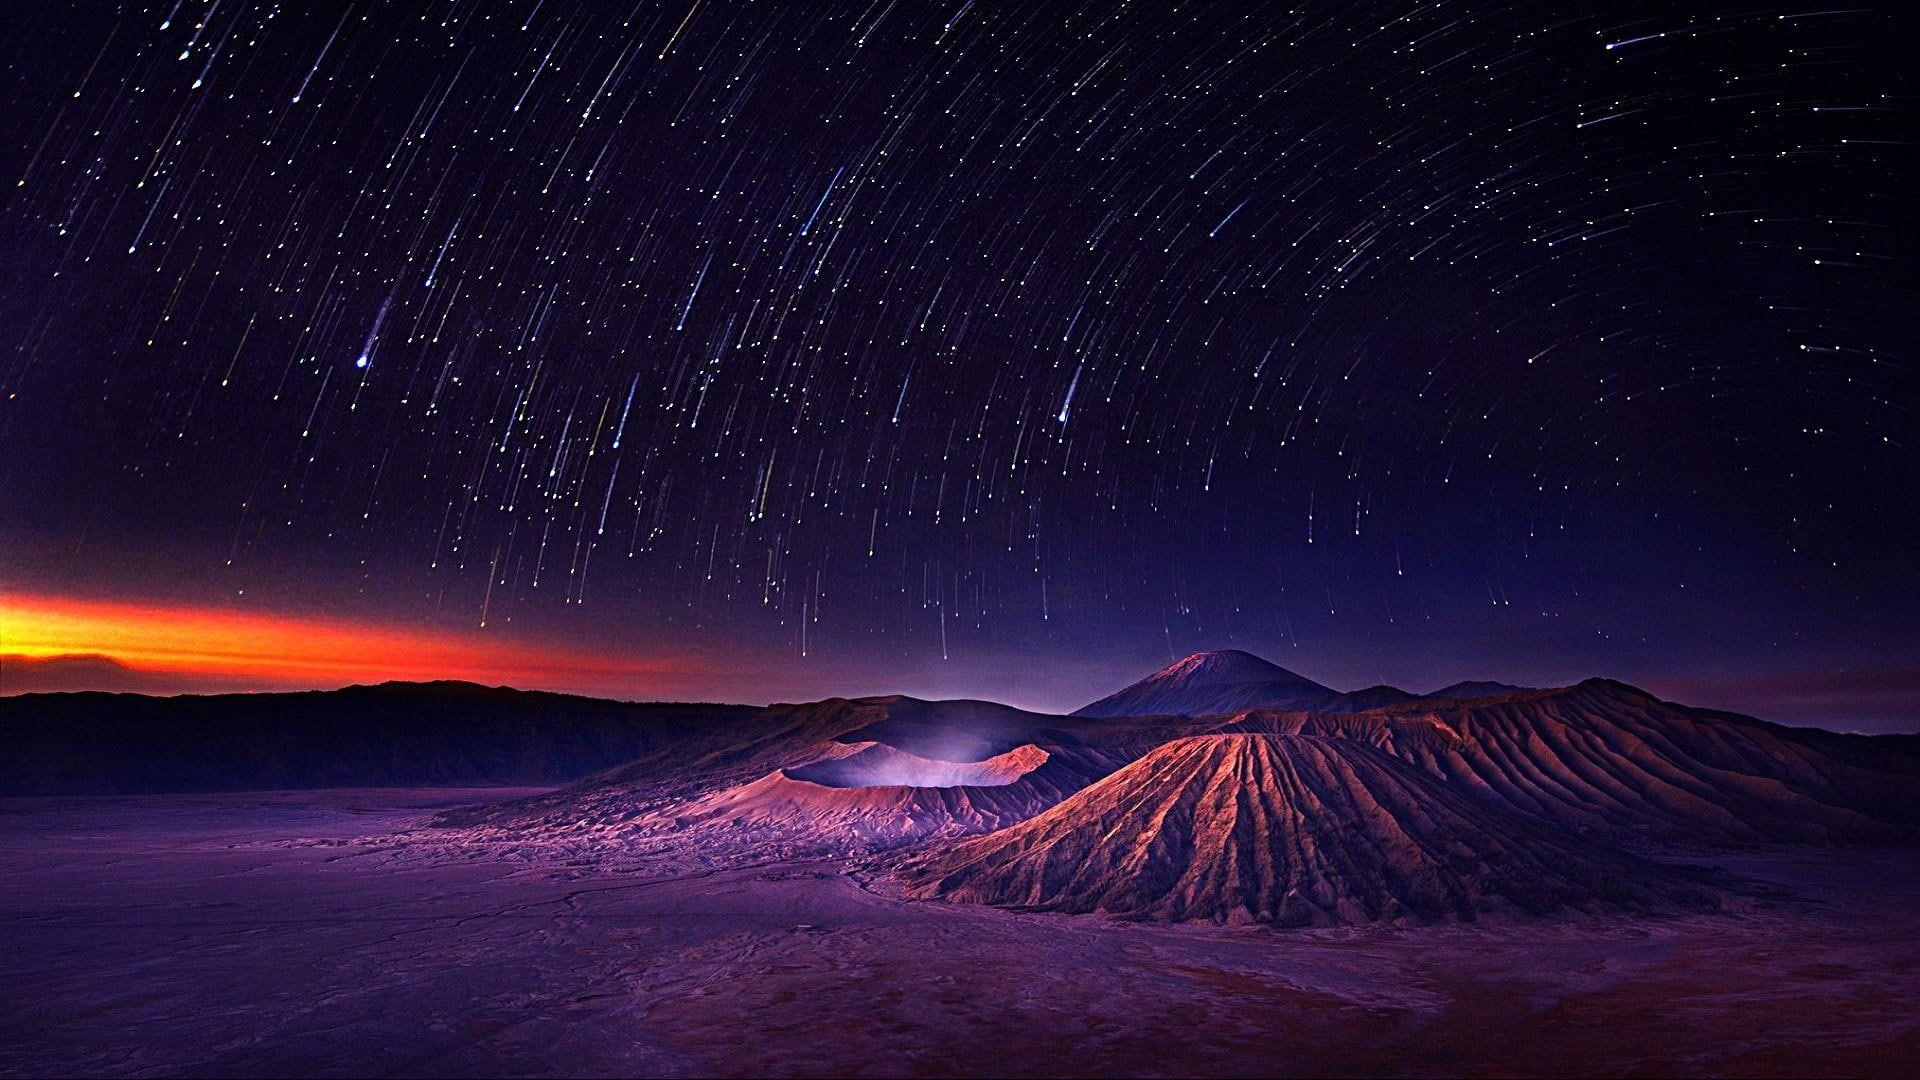 Night Starry Night Night Sky Starry Sky Landscape Darkness Star Trails Falling Star Space Sky Star Earth H Night Skies Starry Night Sky Star Background